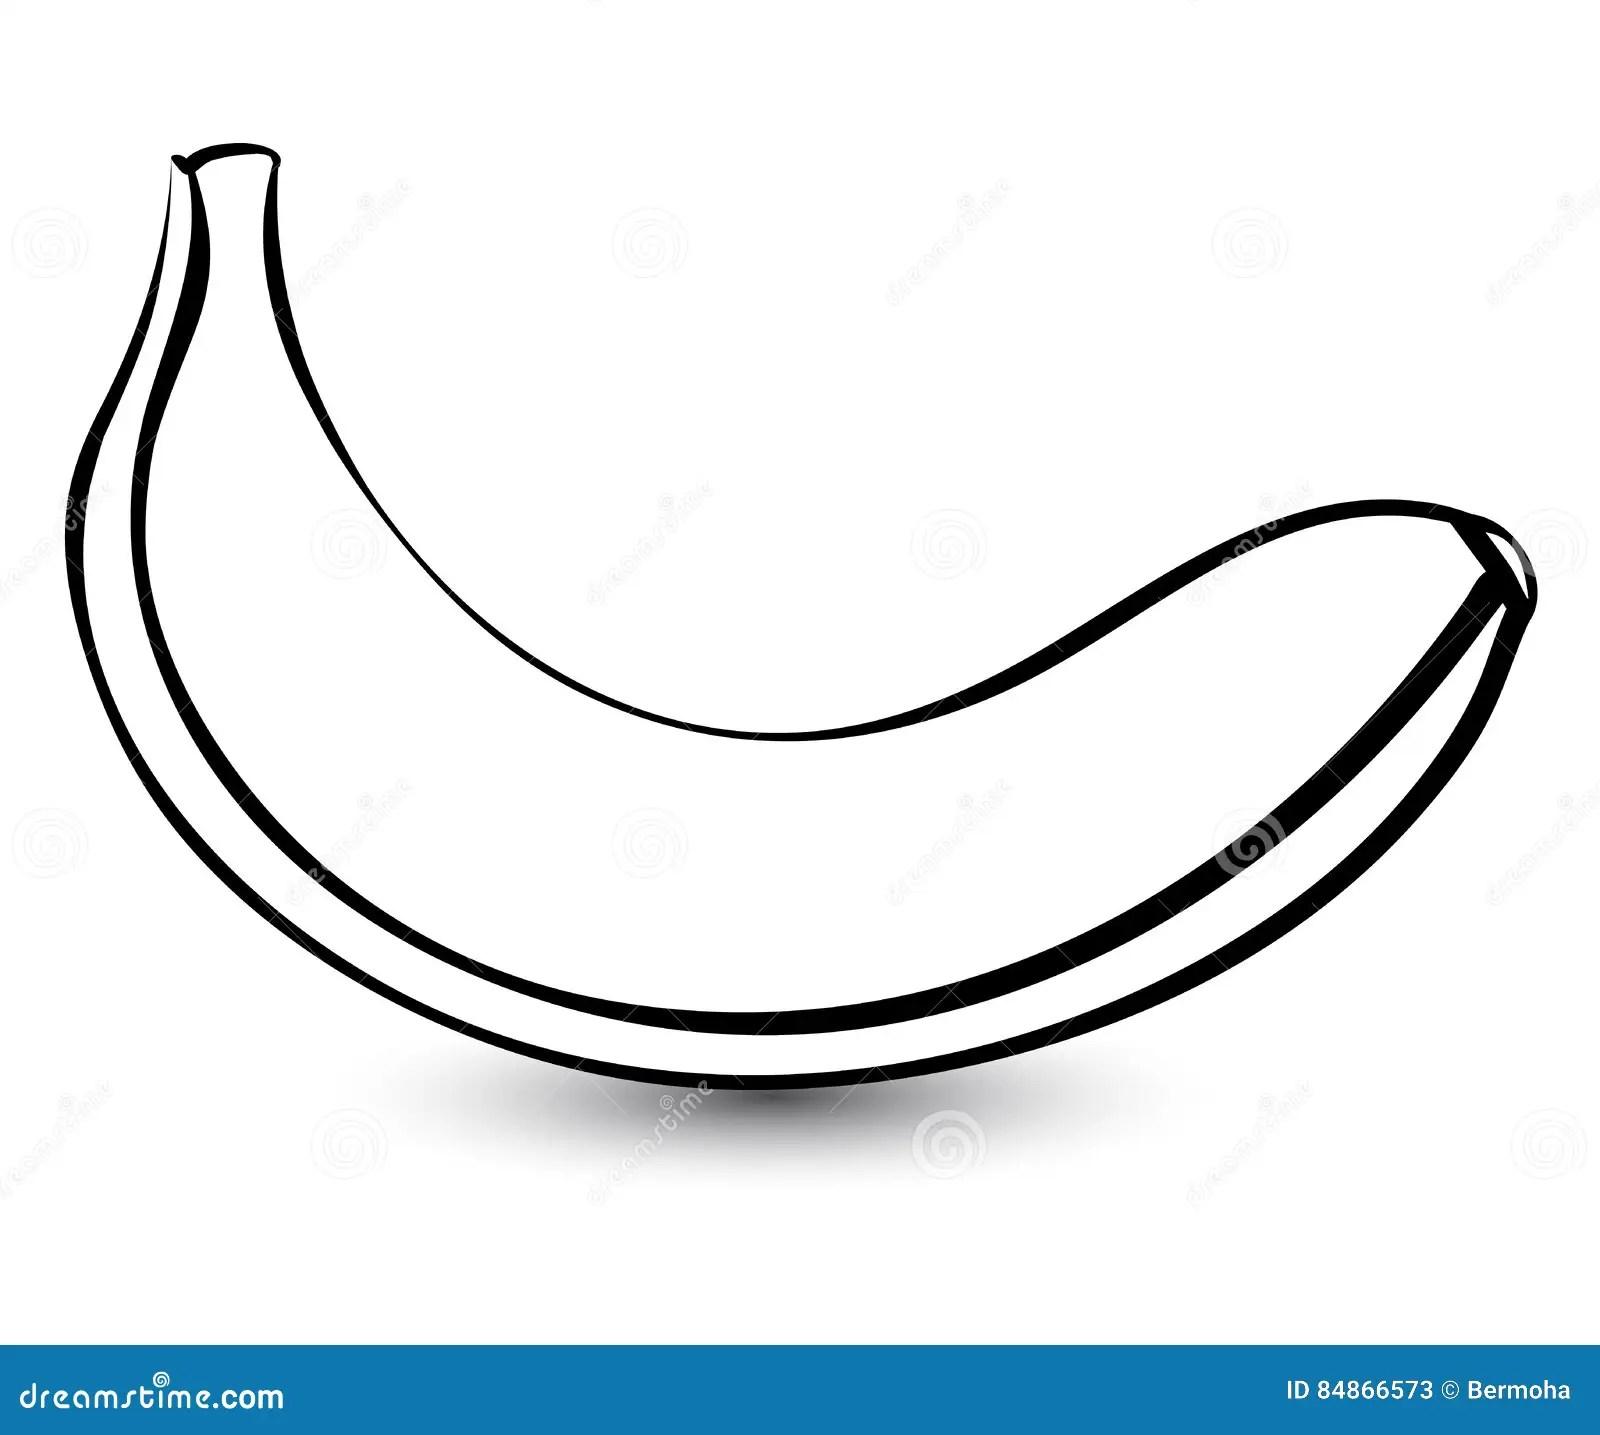 Outline Sketch Monochrome Banana. Cartoon Vector